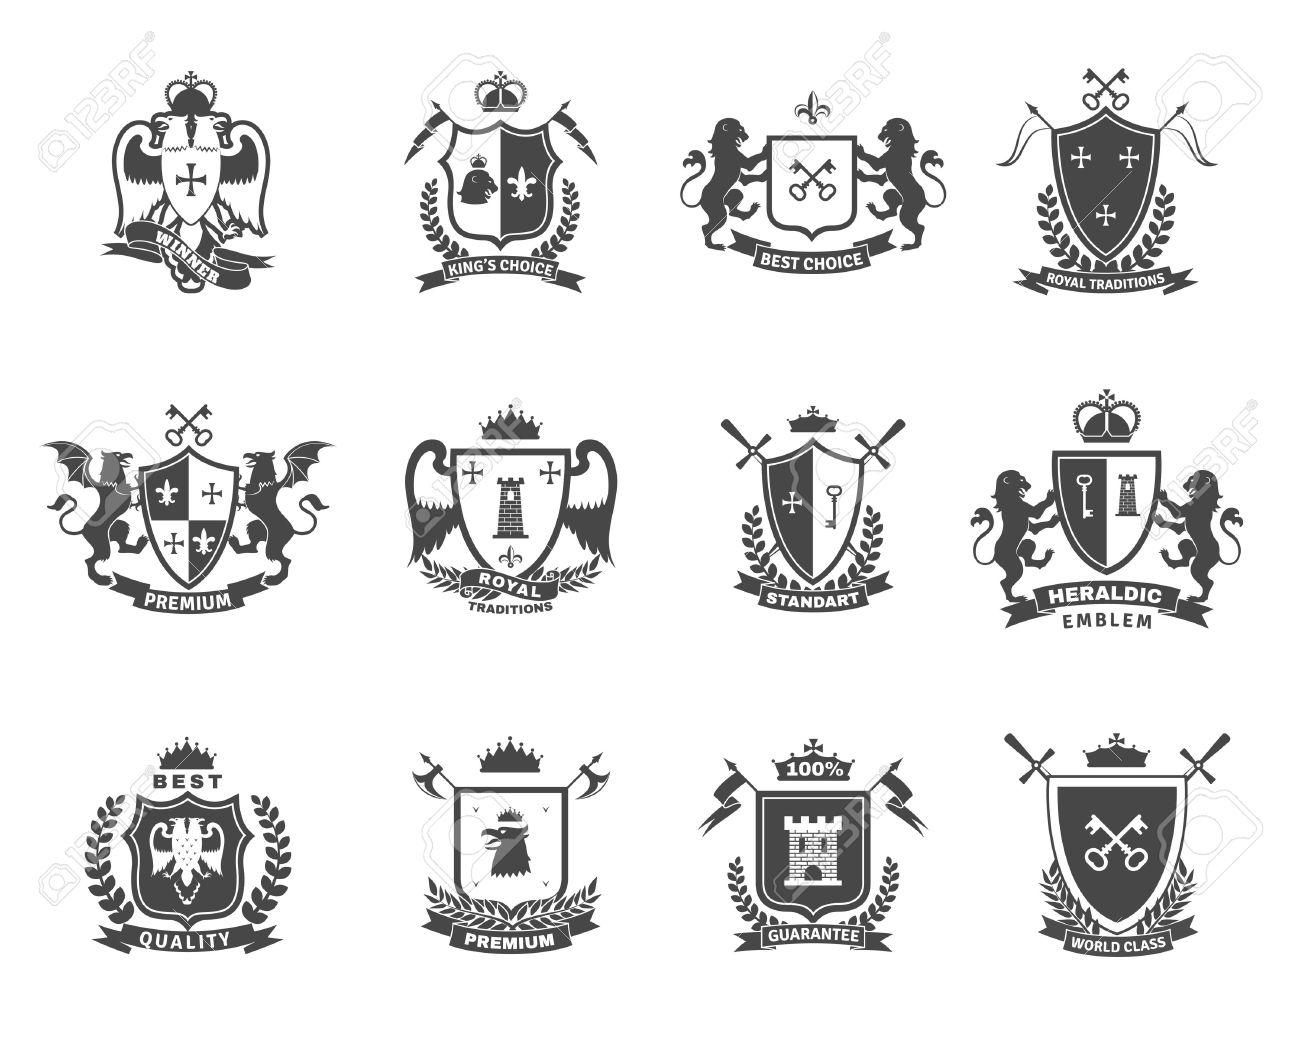 Heraldic premium quality black white emblems set with royal traditions symbols flat isolated vector illustration - 46499242